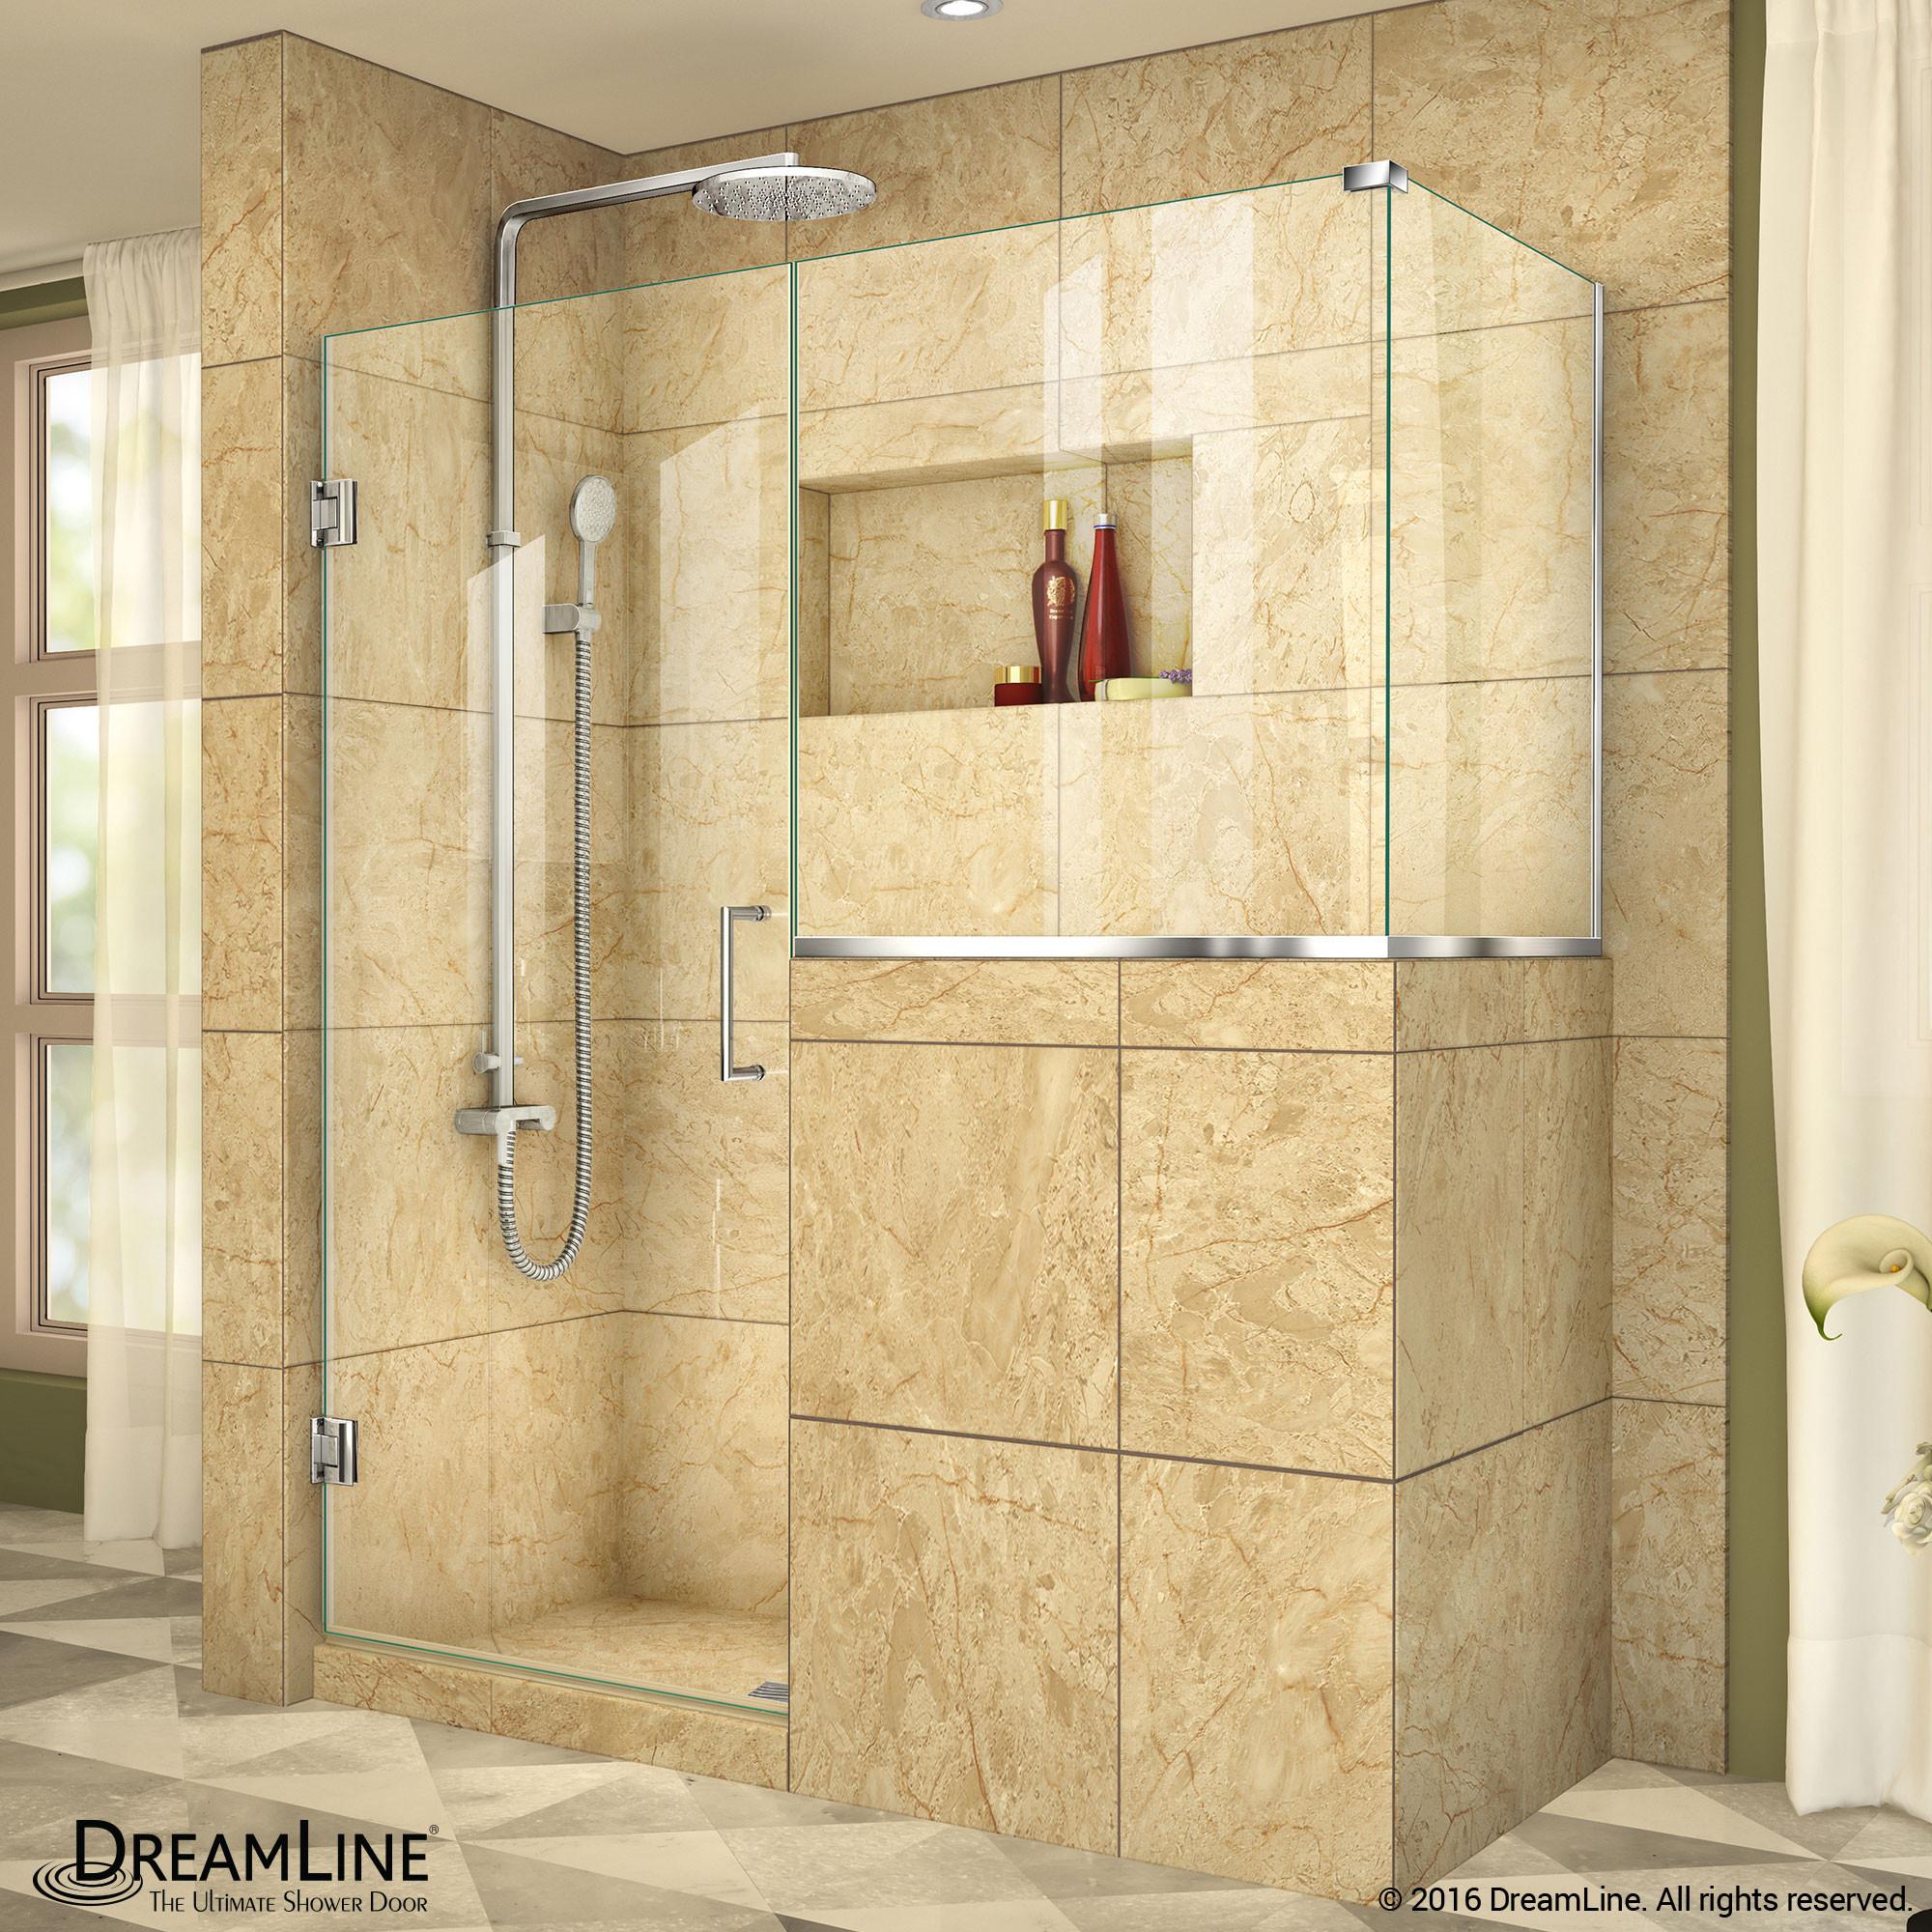 "DreamLine SHEN-2427303430-01 Unidoor Plus 57 x 30.375 x 72"" Hinged Shower Enclosure In Chrome Finish"